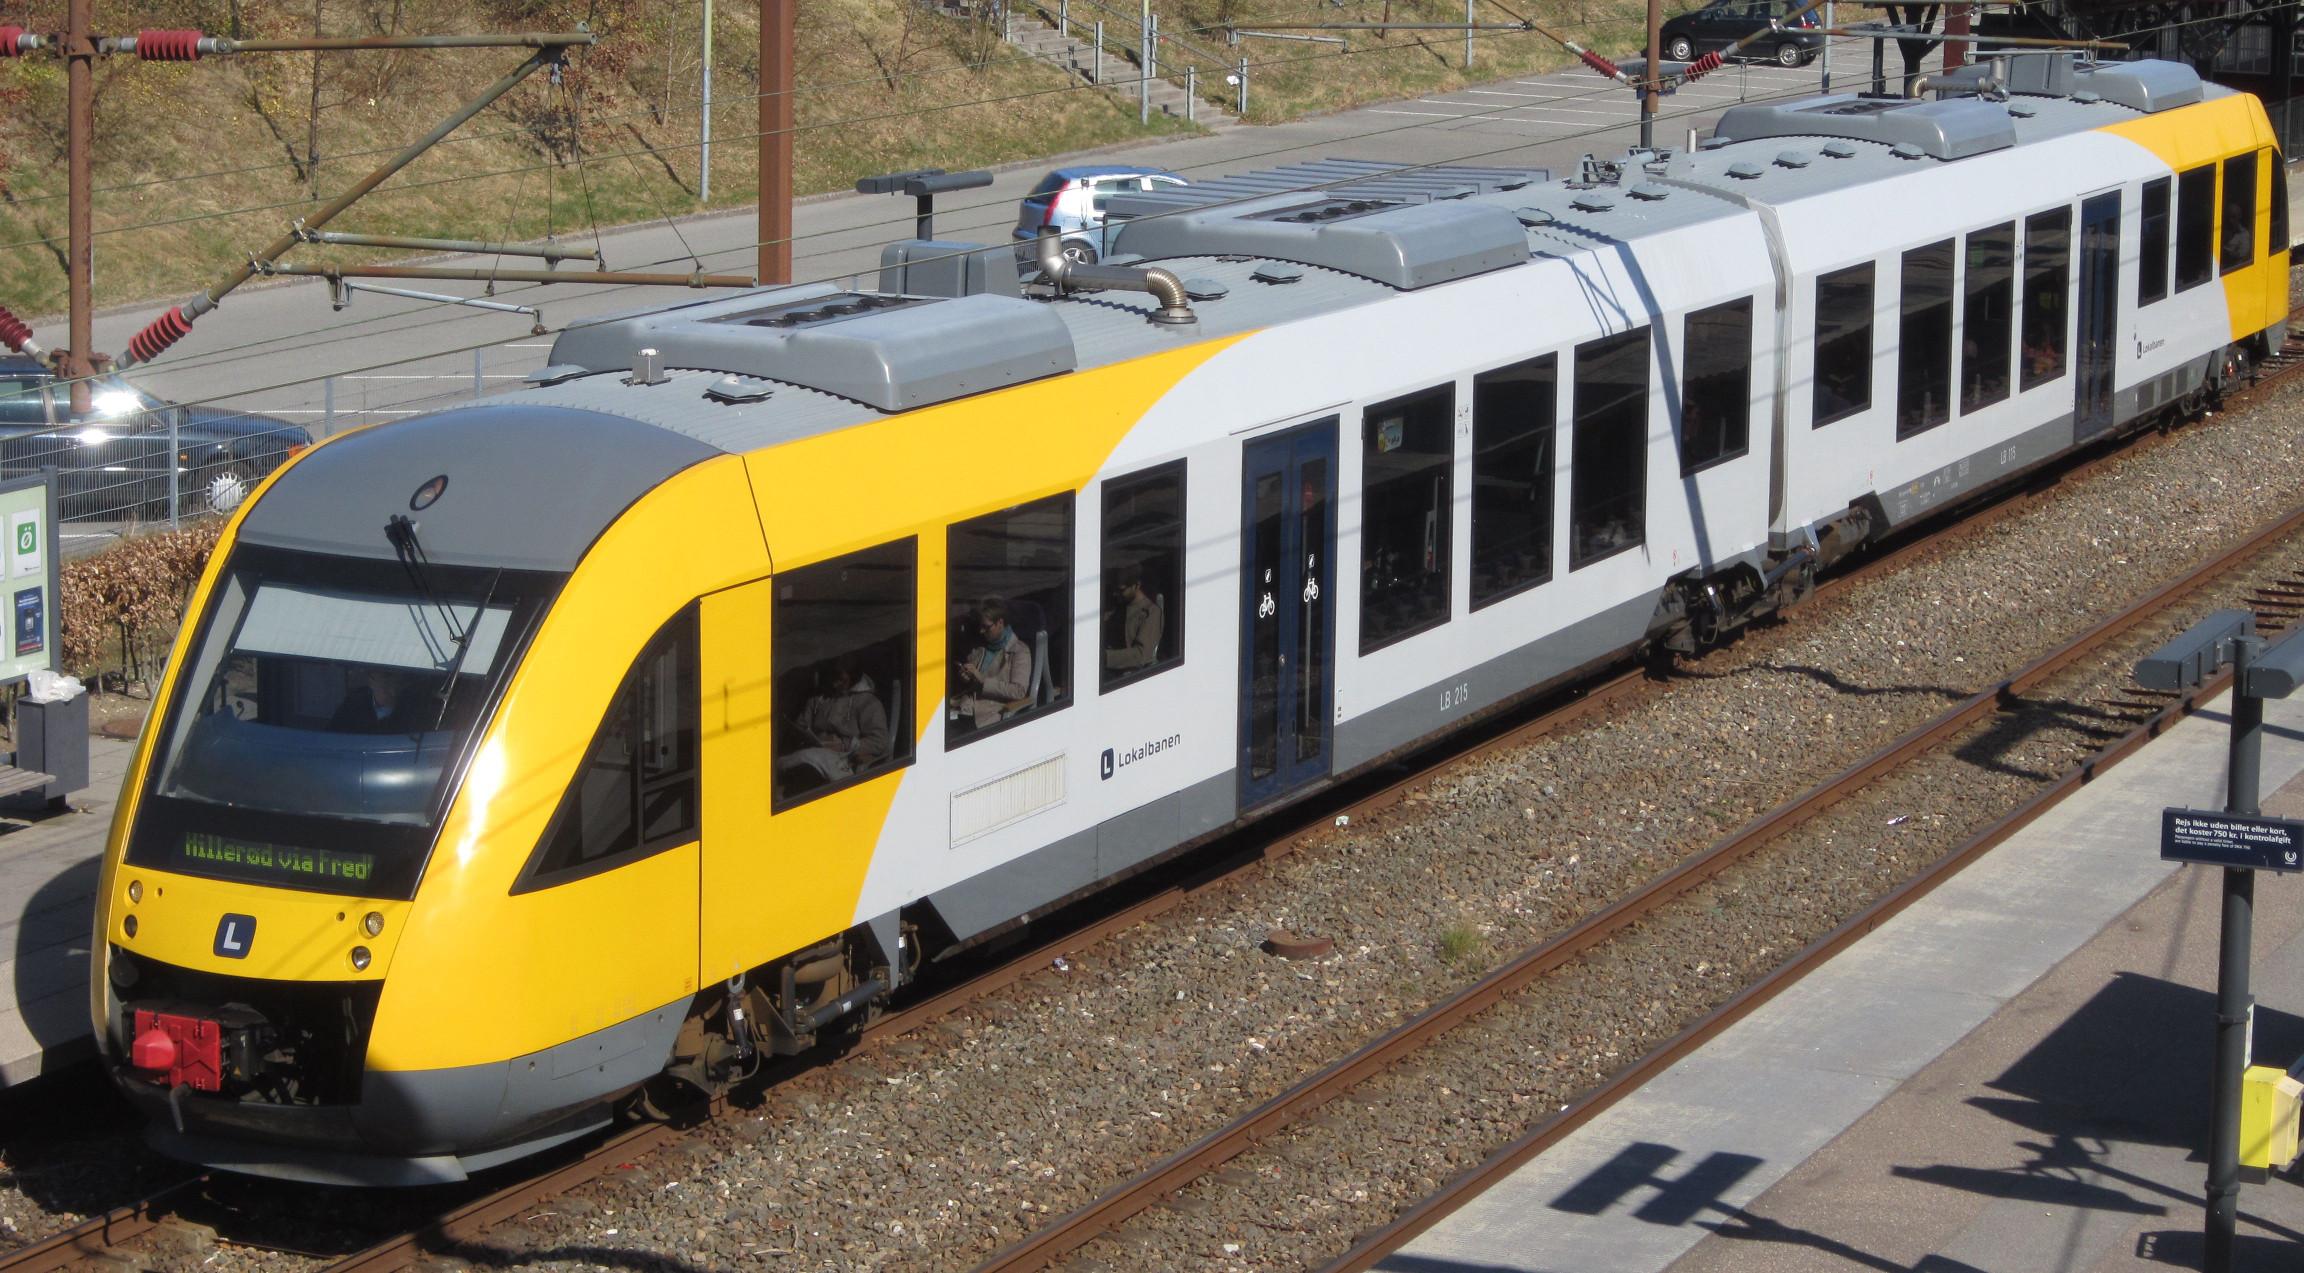 Lokalbanen to Hilleroed